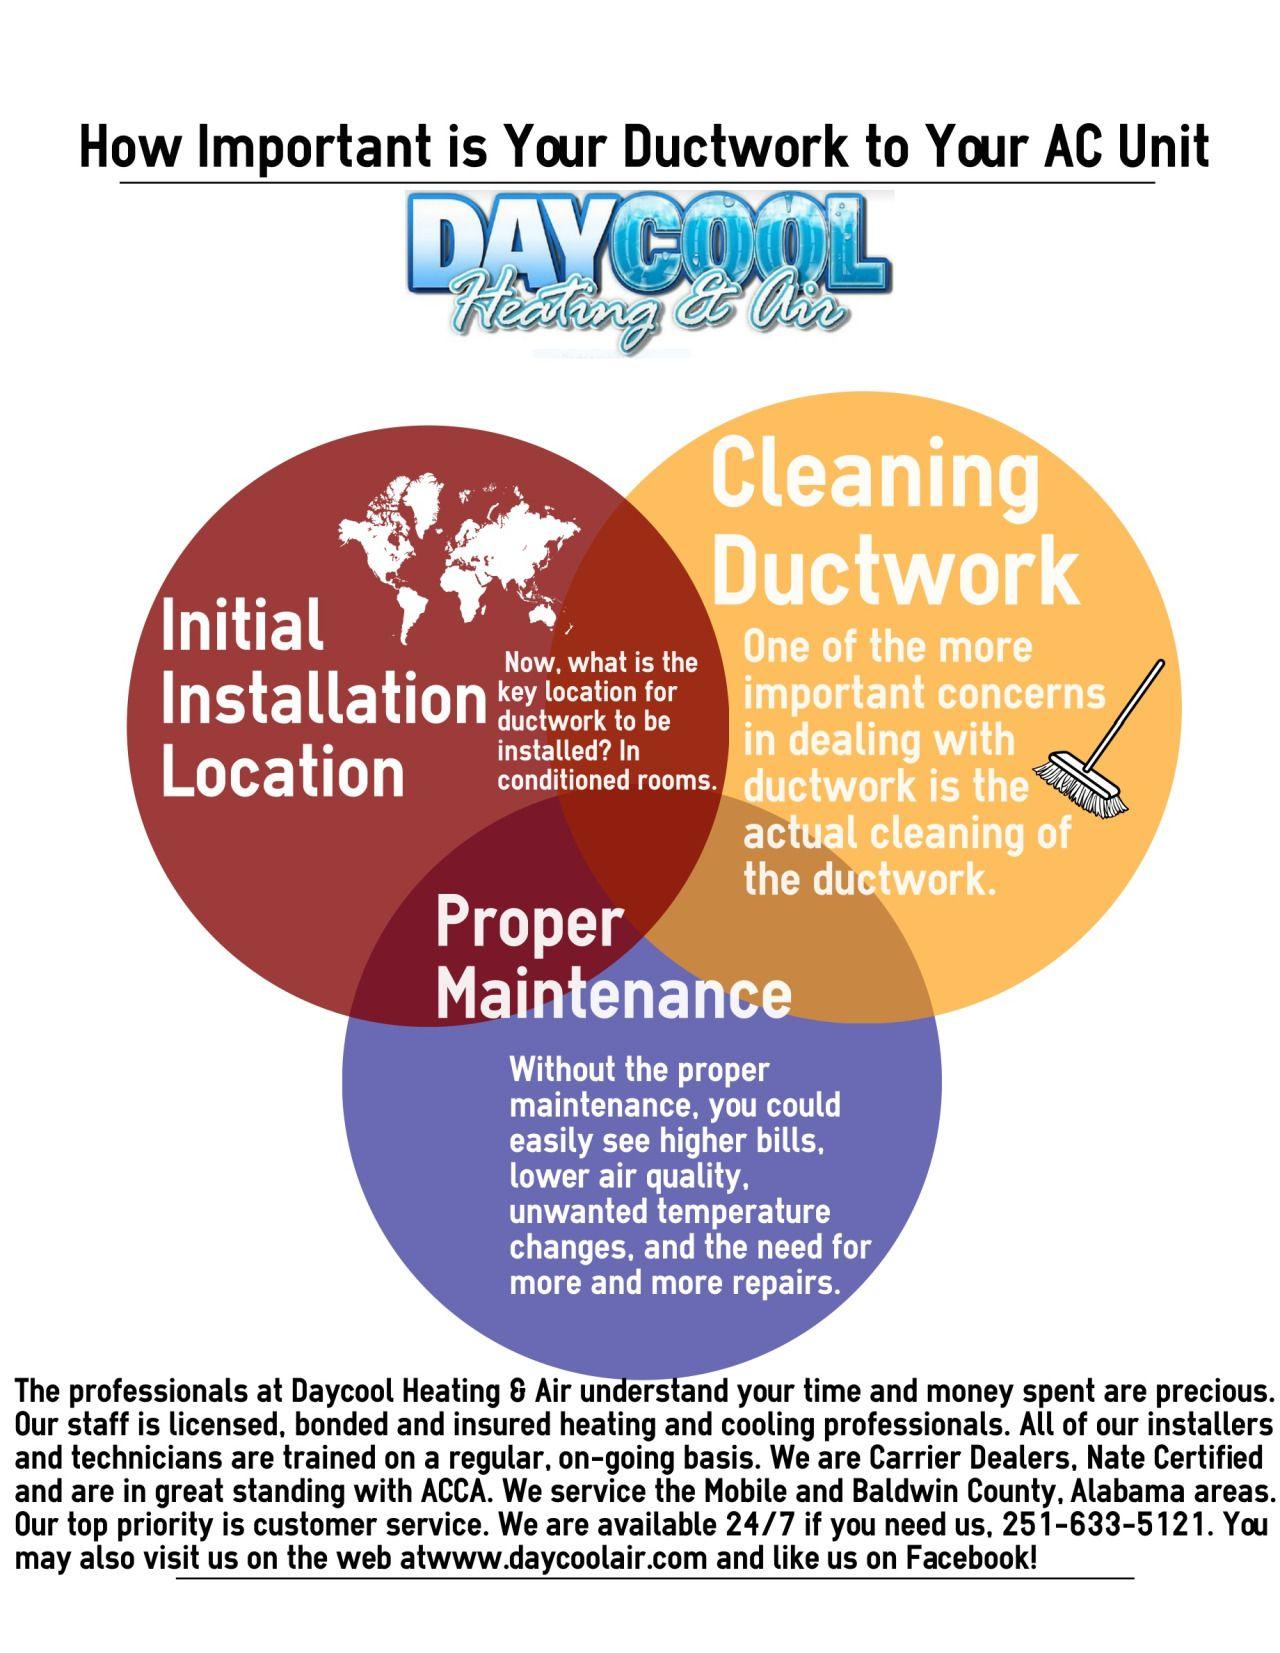 Daycool Heating & Air Duct work, Air heating, Ac units